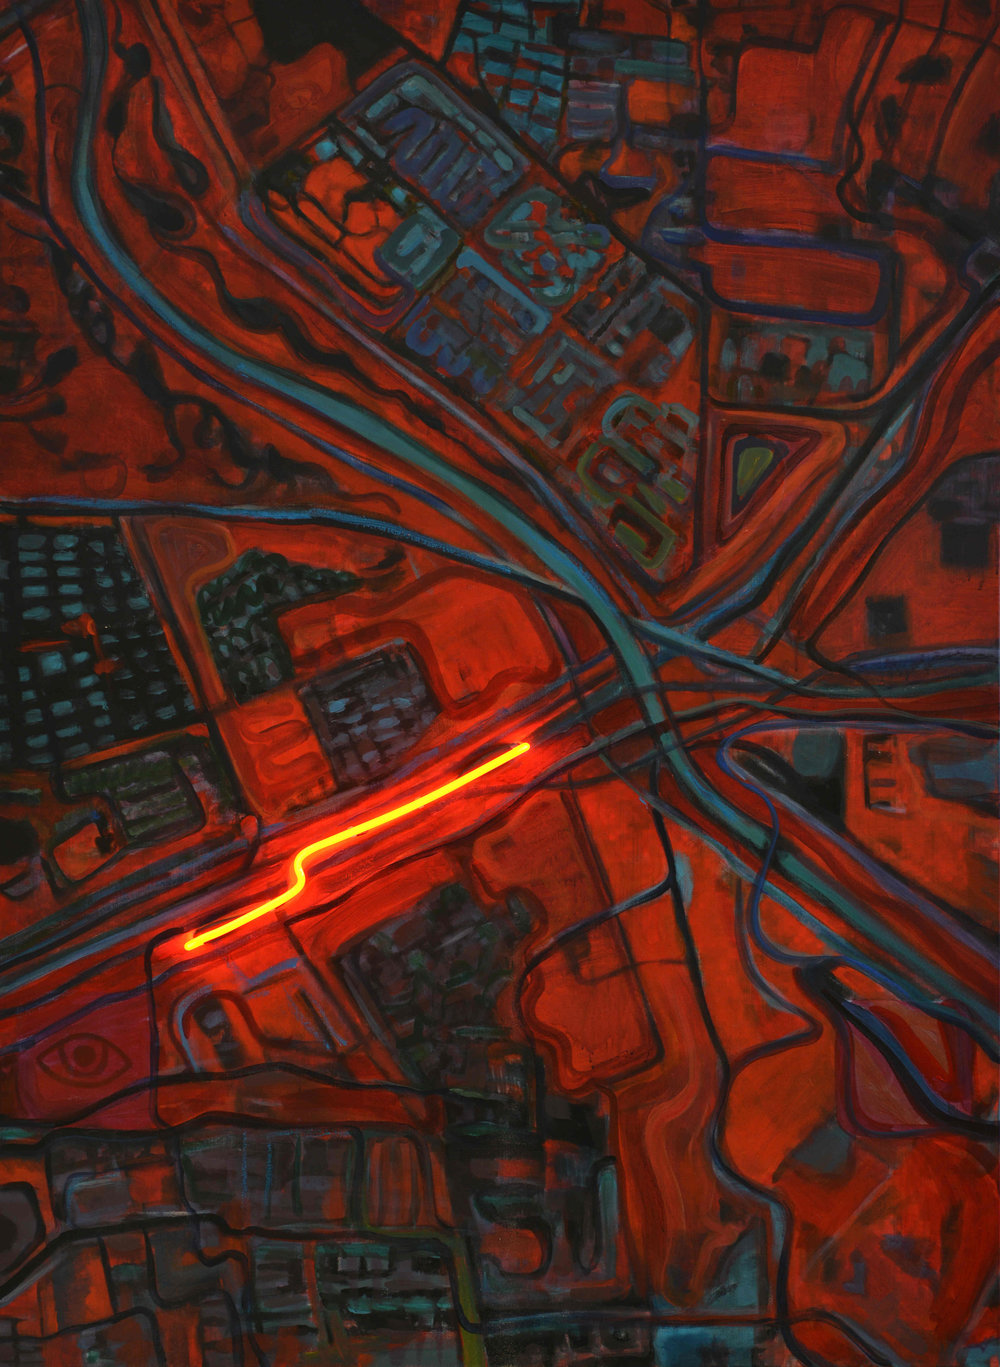 行走 No2  霓虹灯、丙烯和综合材料于帆布Walking  No 2 Neon, Acrylic and Mixed Medium on Canvas_副本.jpg